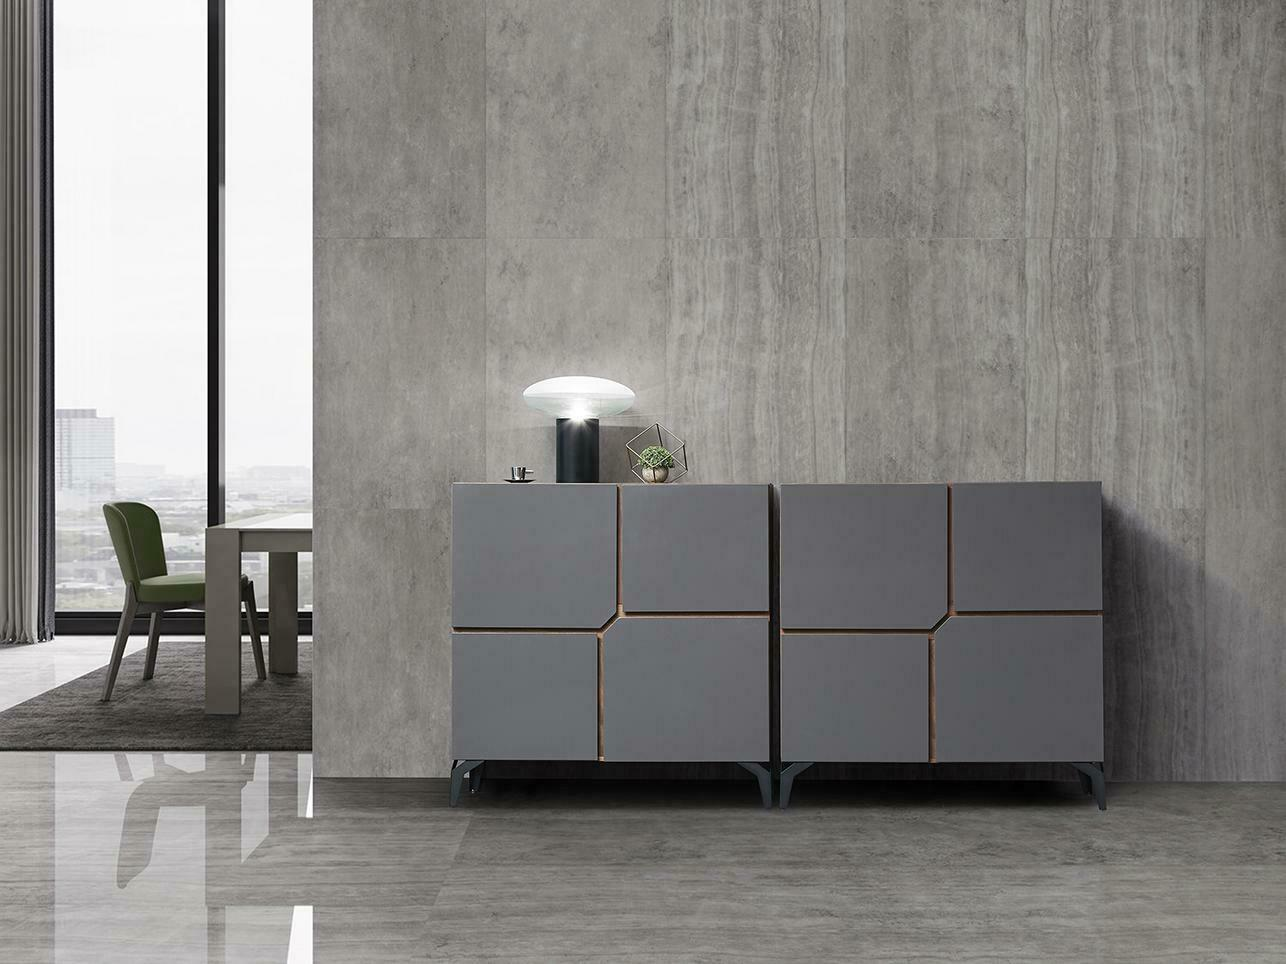 XXL doble 2er cómoda hormigón Design comodas side Board low aparador moderna nuevo